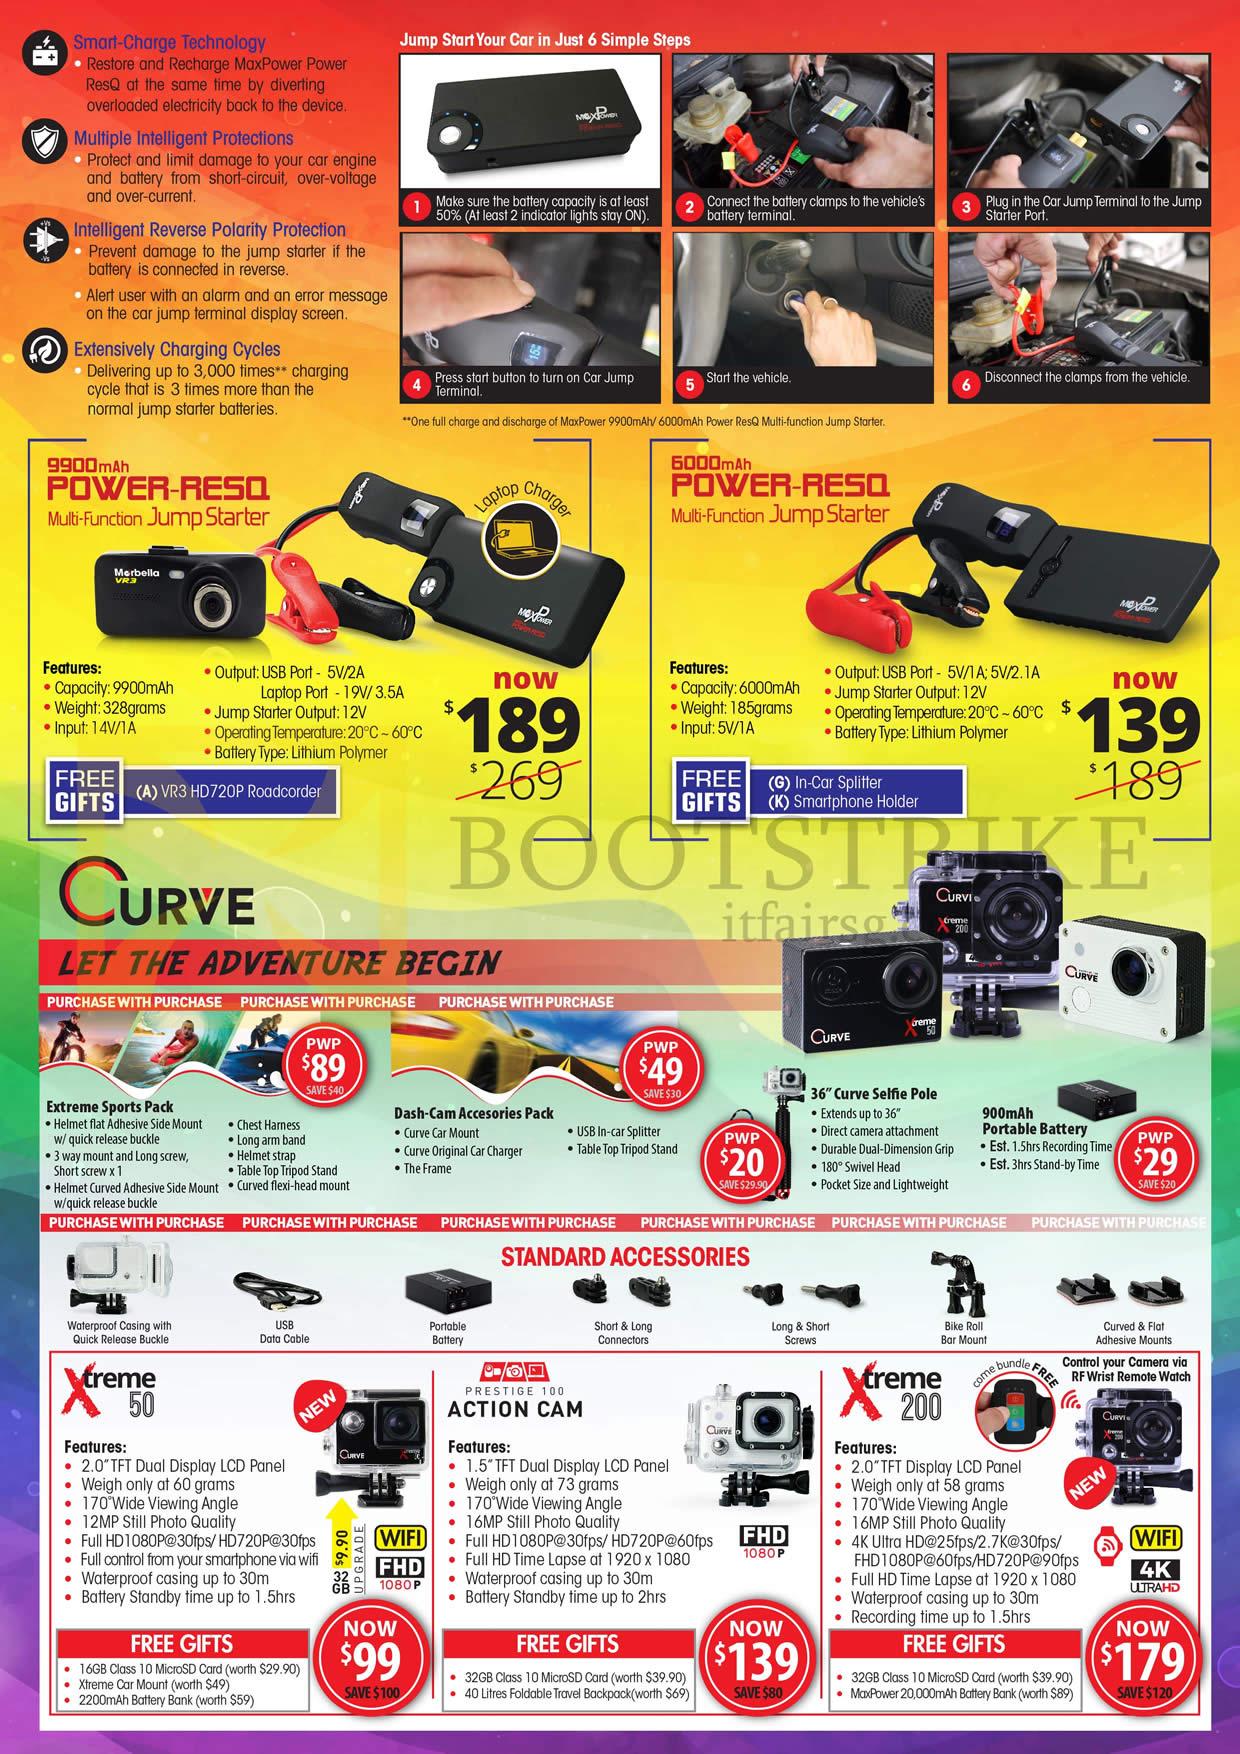 COMEX 2016 price list image brochure of Maka GPS Marbella Car Cameras, Jump Starter, Power RE50, Curve, Xtreme 50, 200, Prestige 100 Action Cam